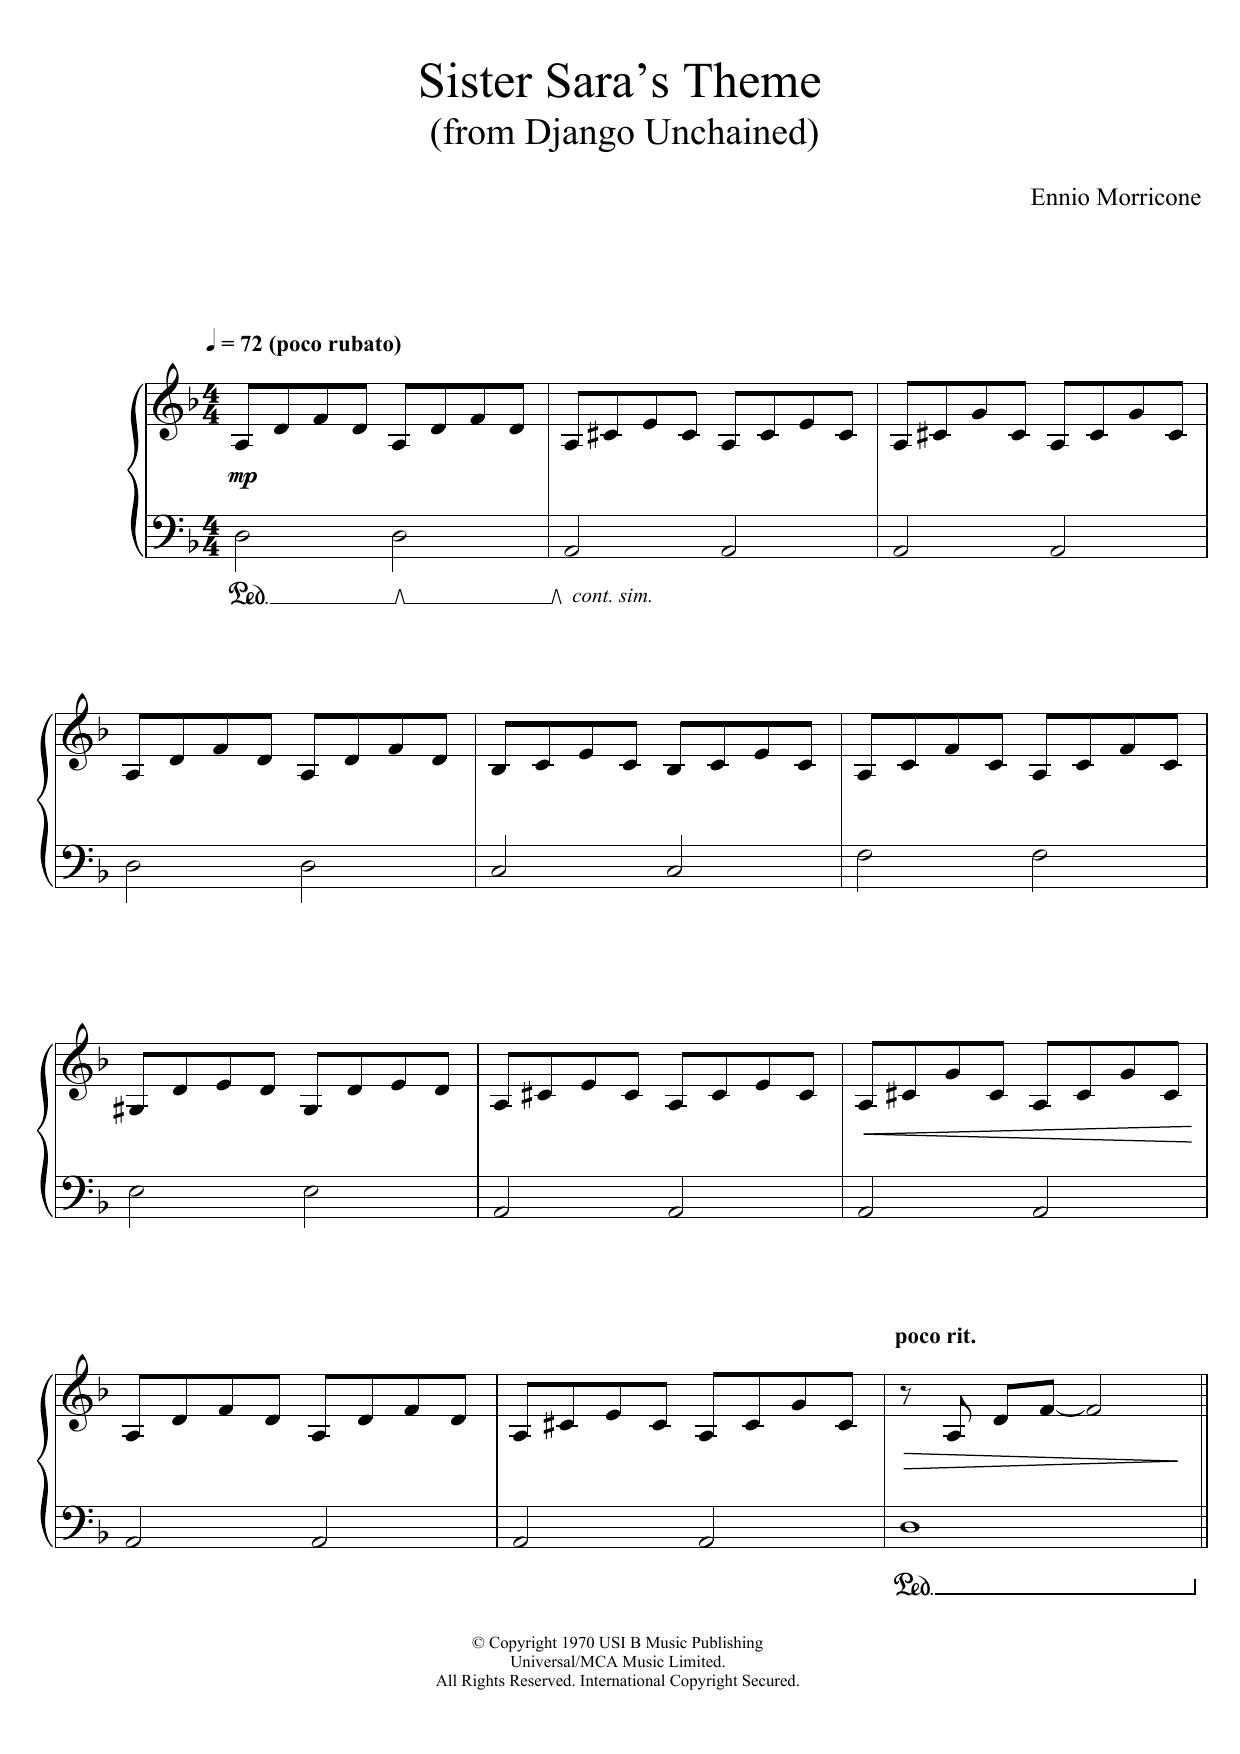 Ennio Morricone - Sister Sara's Theme (Django Unchained)